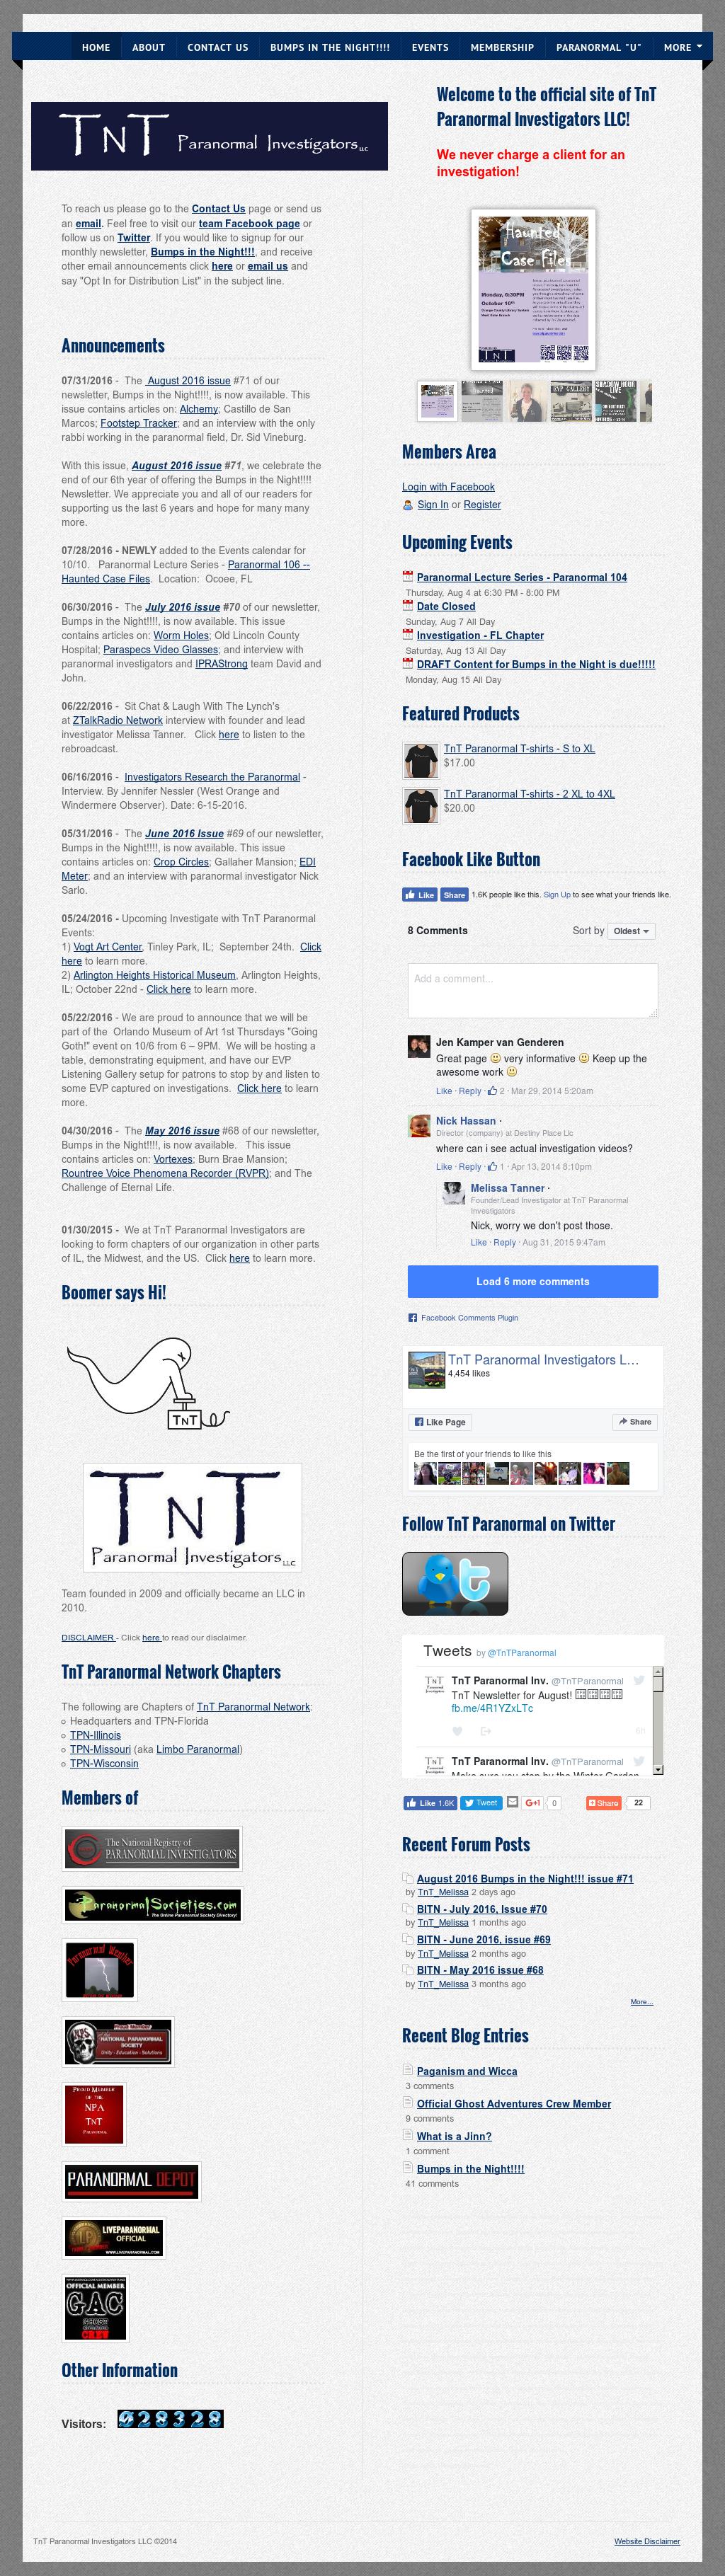 Tnt Paranormal Investigators Competitors, Revenue and